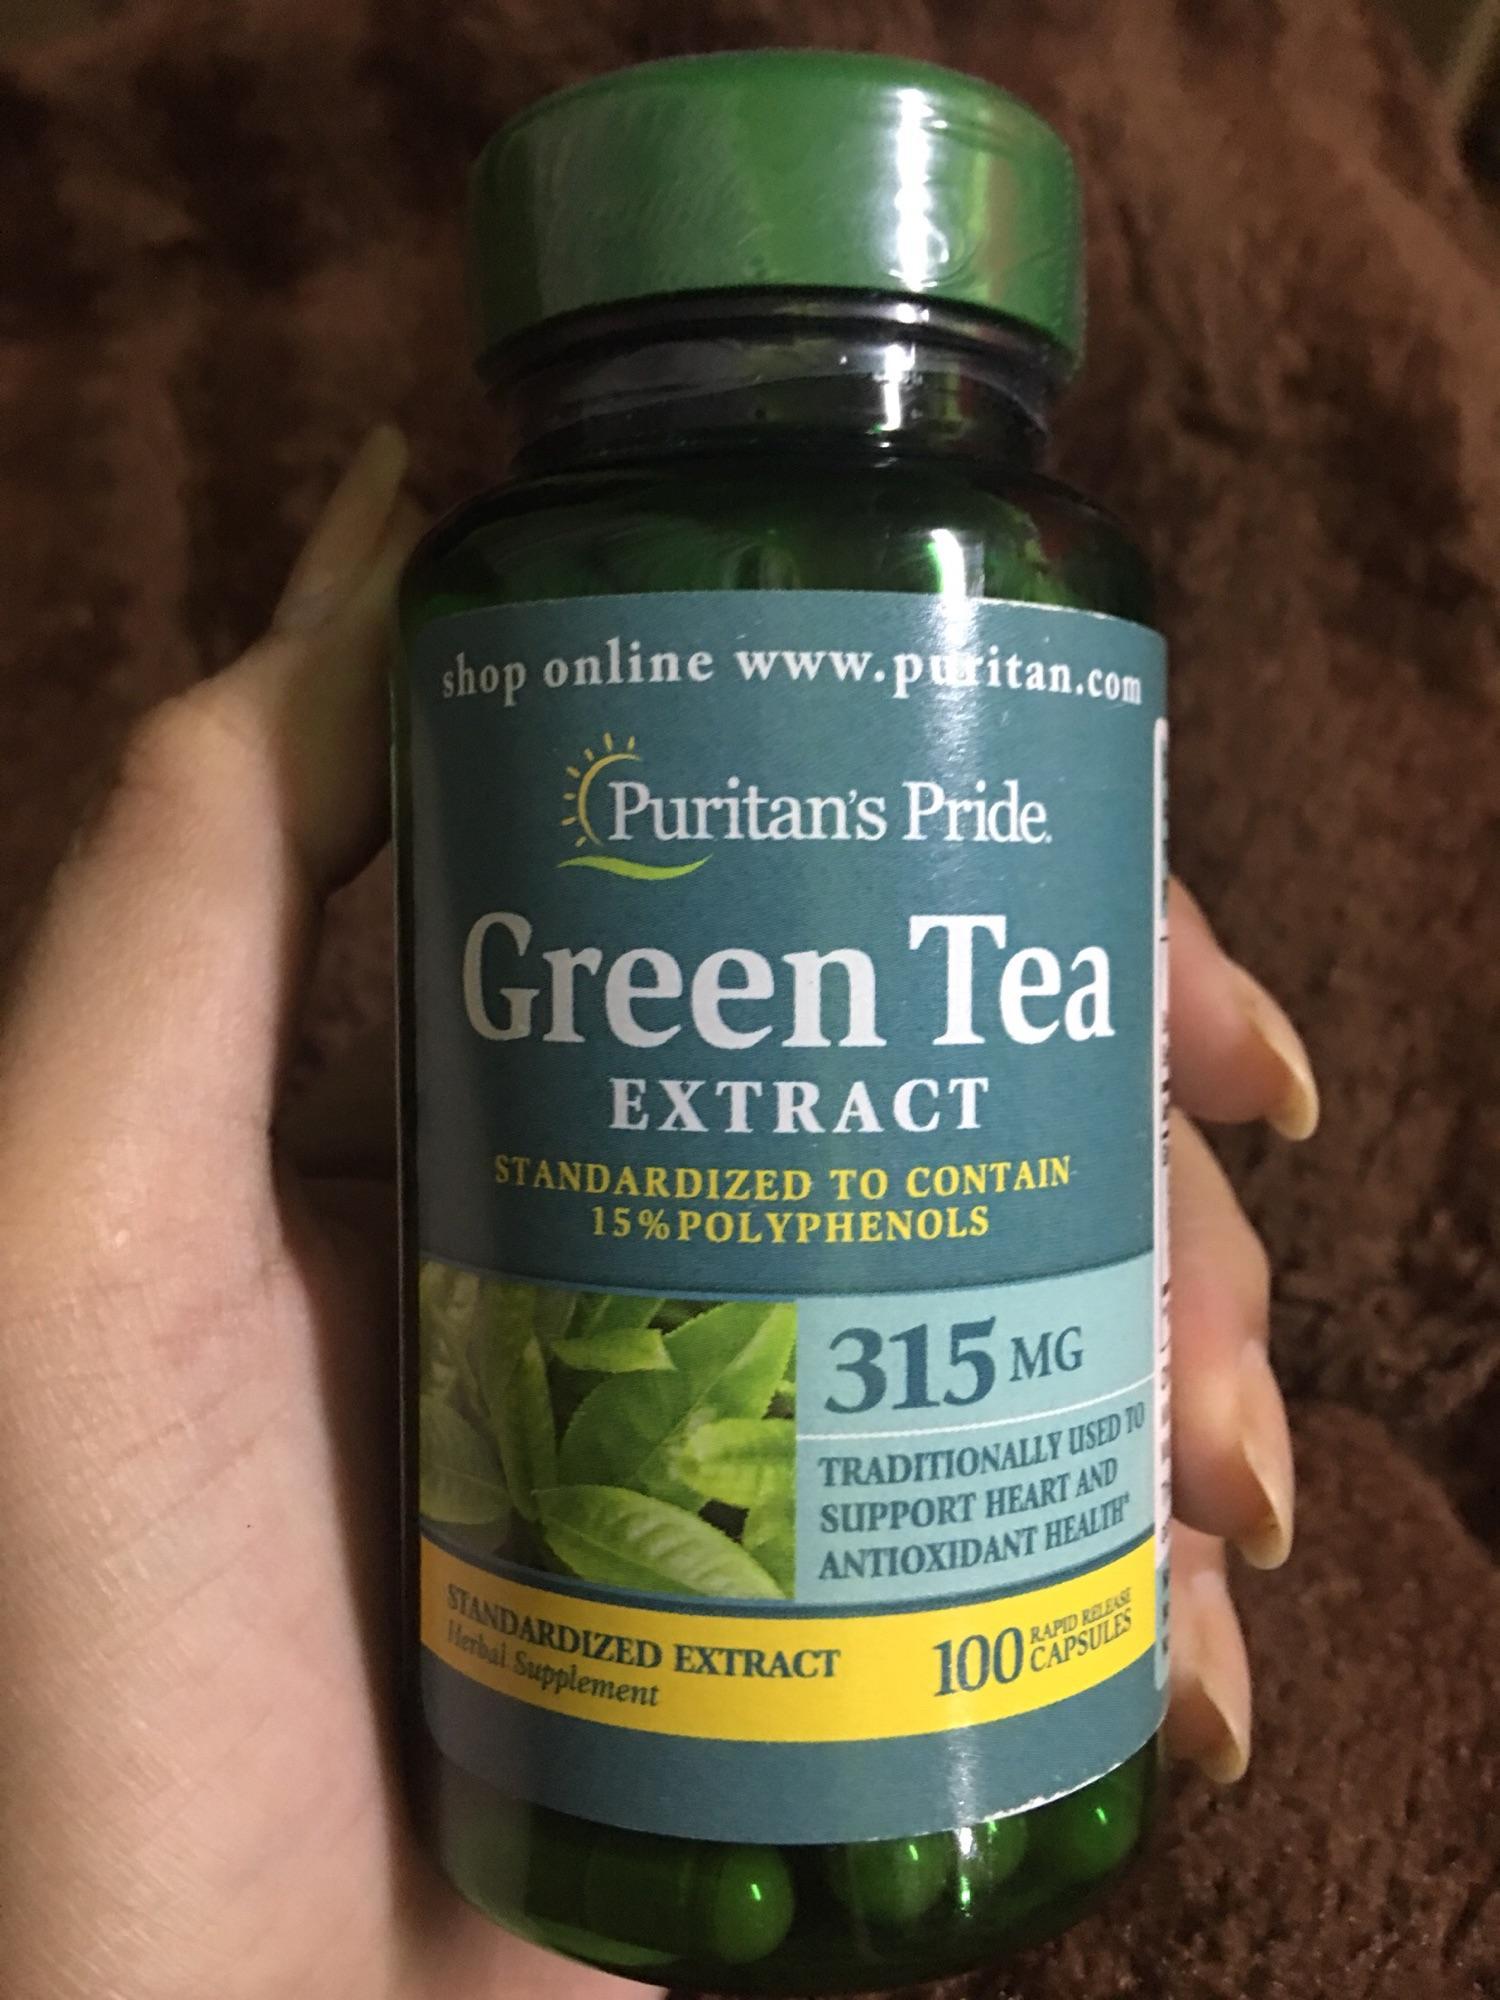 Puritans Pride Philippines Price List Puritan Triple Strength Glucosamine 90 Caps Green Tea Extract 315mg 100capsules